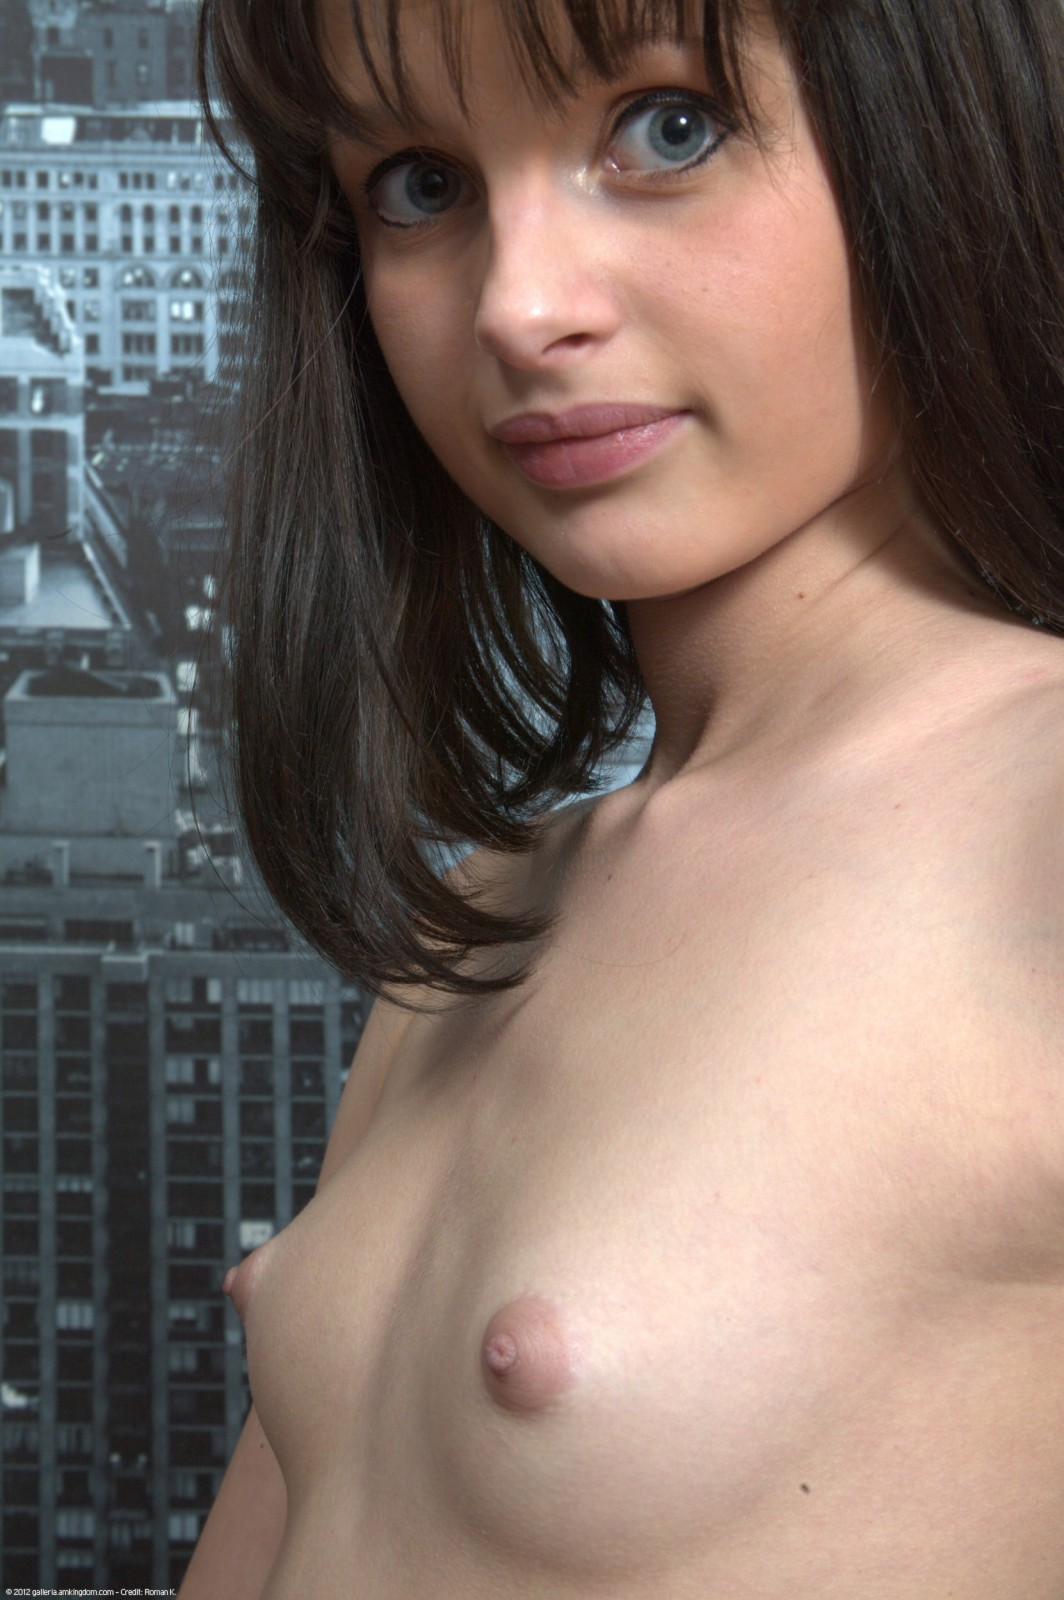 Titts pics young A Breast